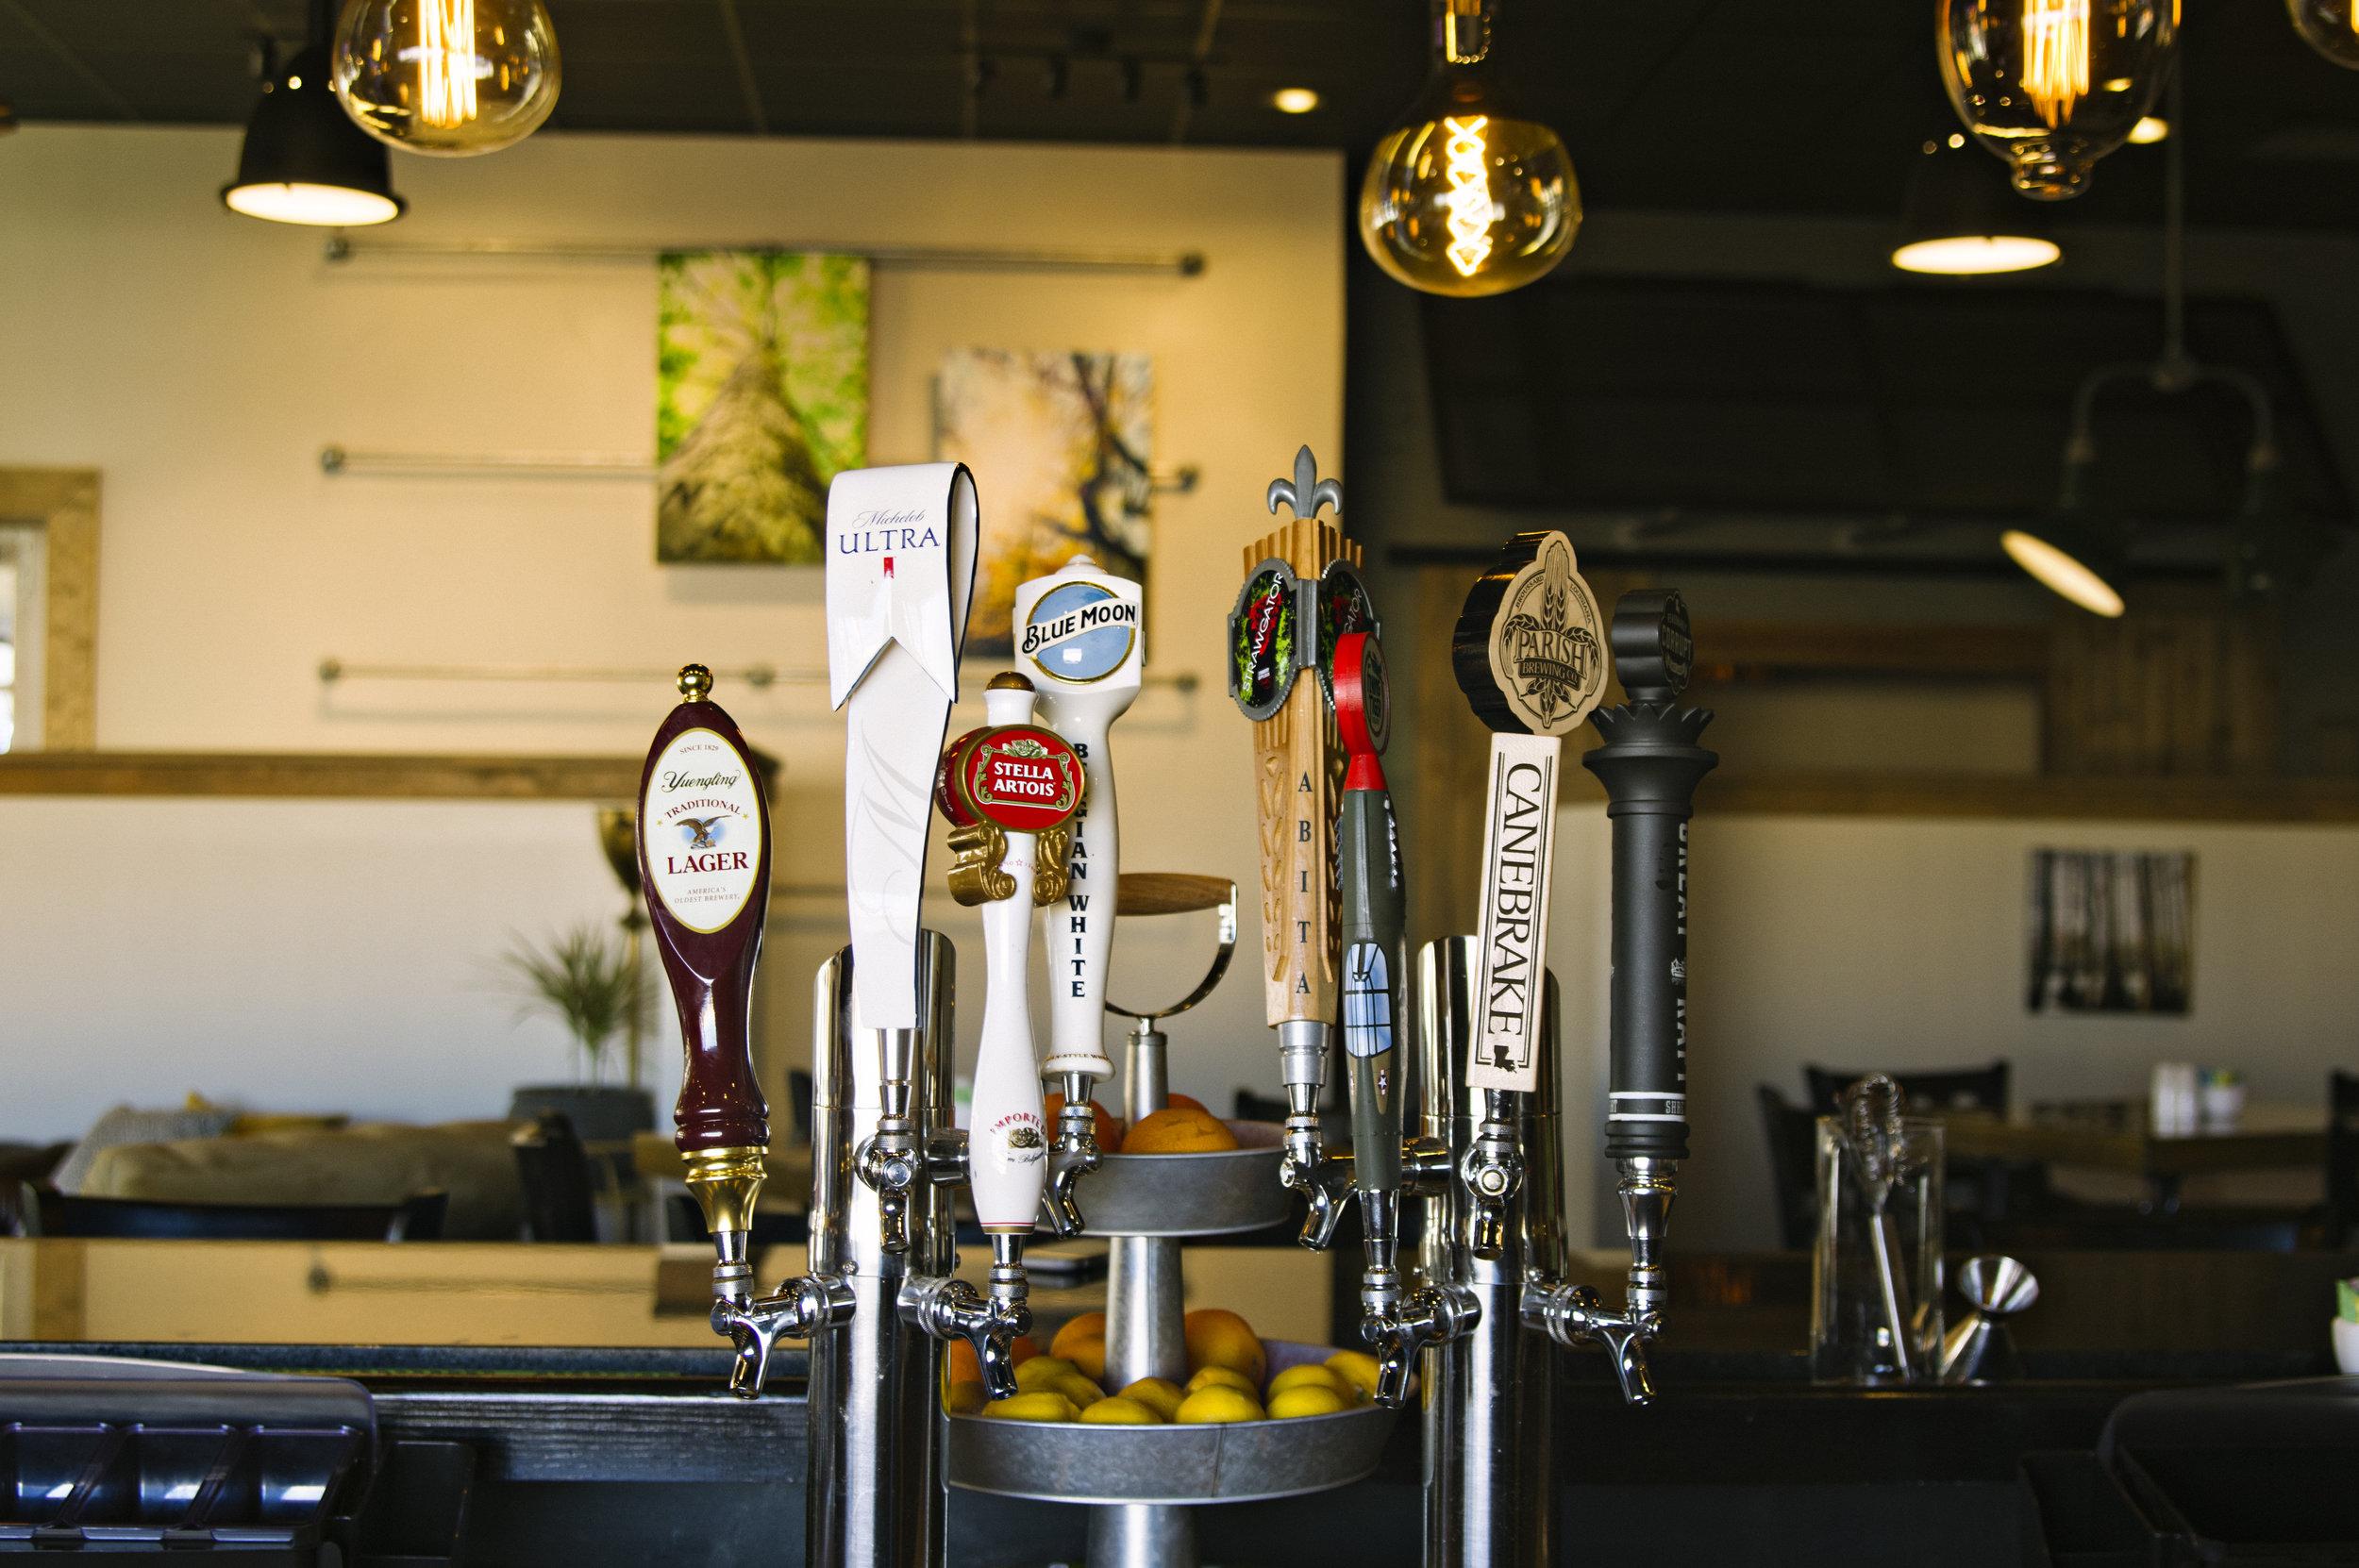 Beer taps at Bayou Roux